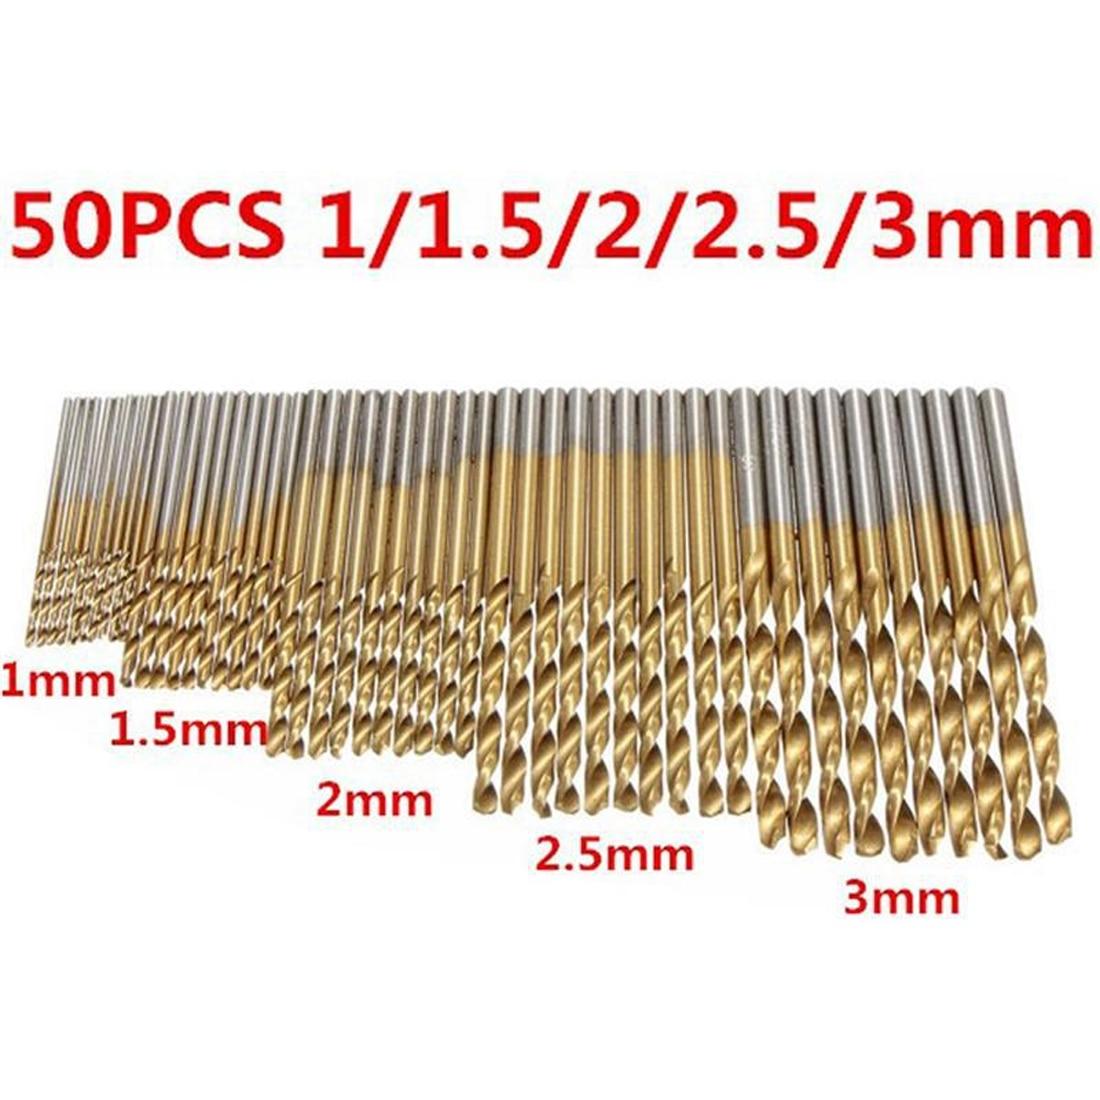 New 50Pcs Titanium Coated Drill Bits HSS High Speed Steel Drill Bits Set Tool High Quality Power Tools 1/1.5/2.0/2.5/3mm